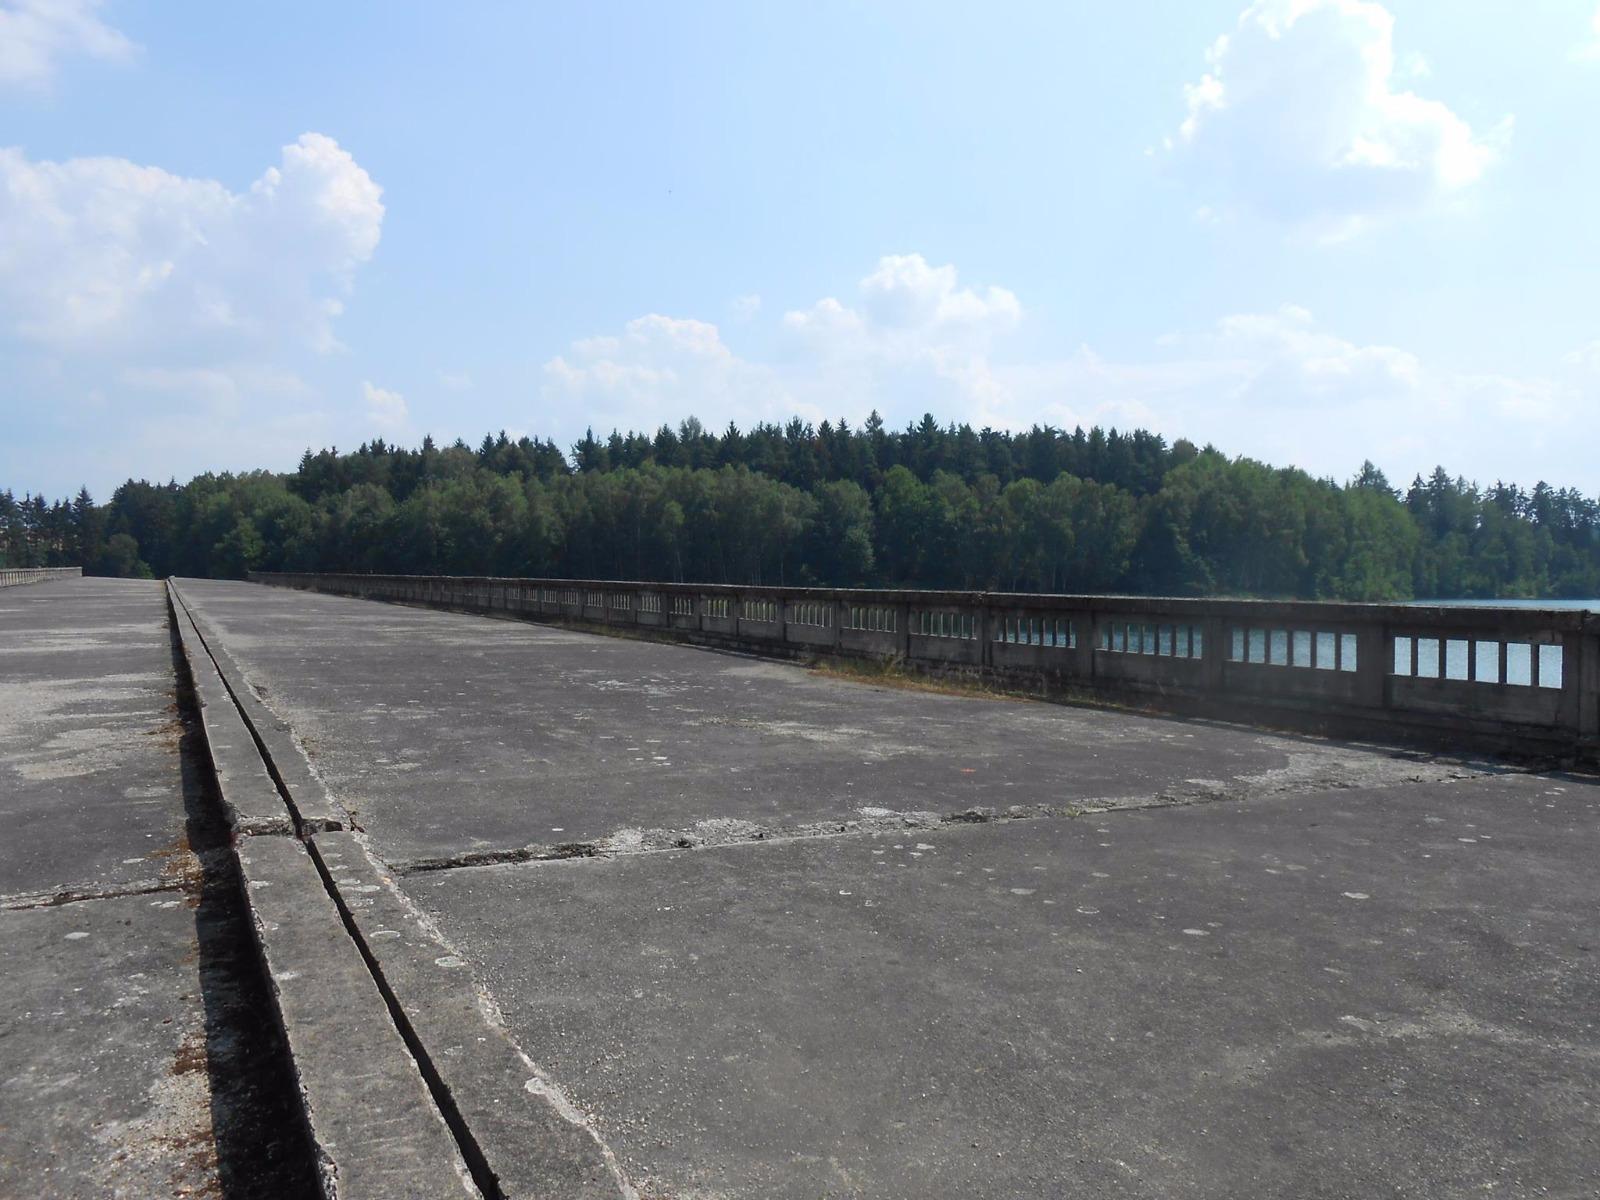 Nedokončený most Hitlerovy dálnice Borovsko